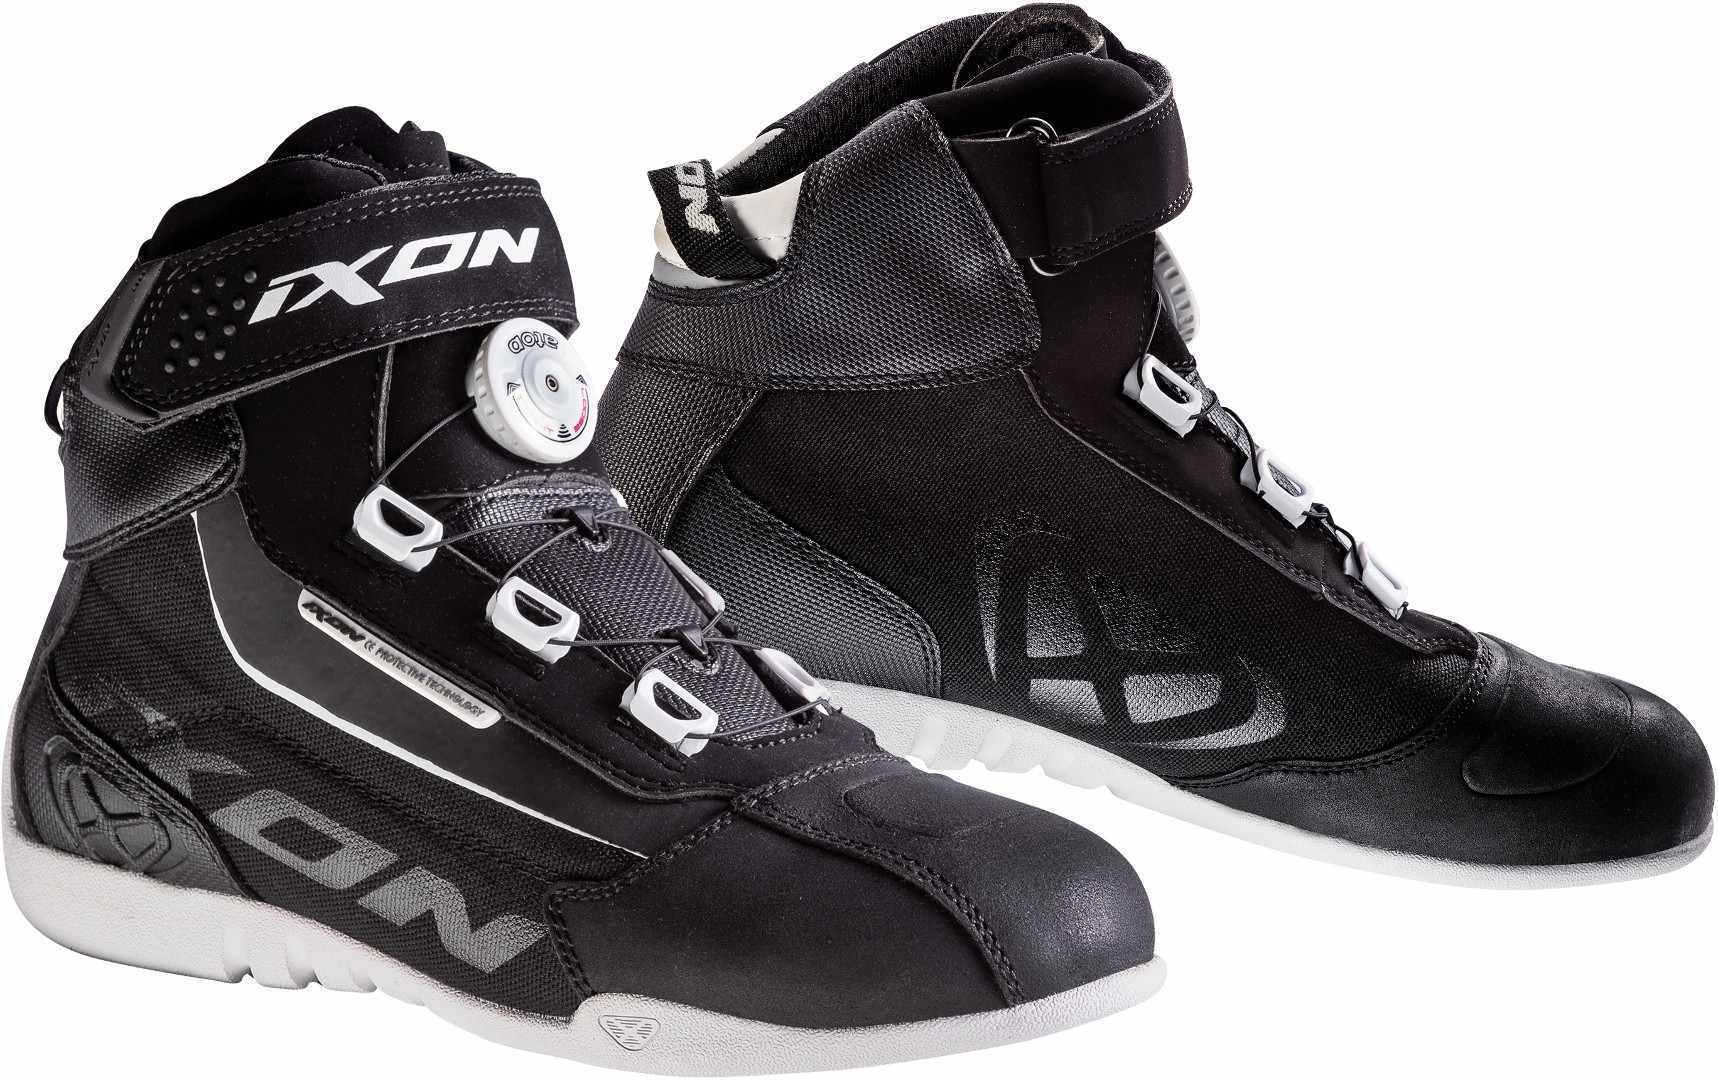 Ixon Assault Evo L Ladies scarpe del motociclo